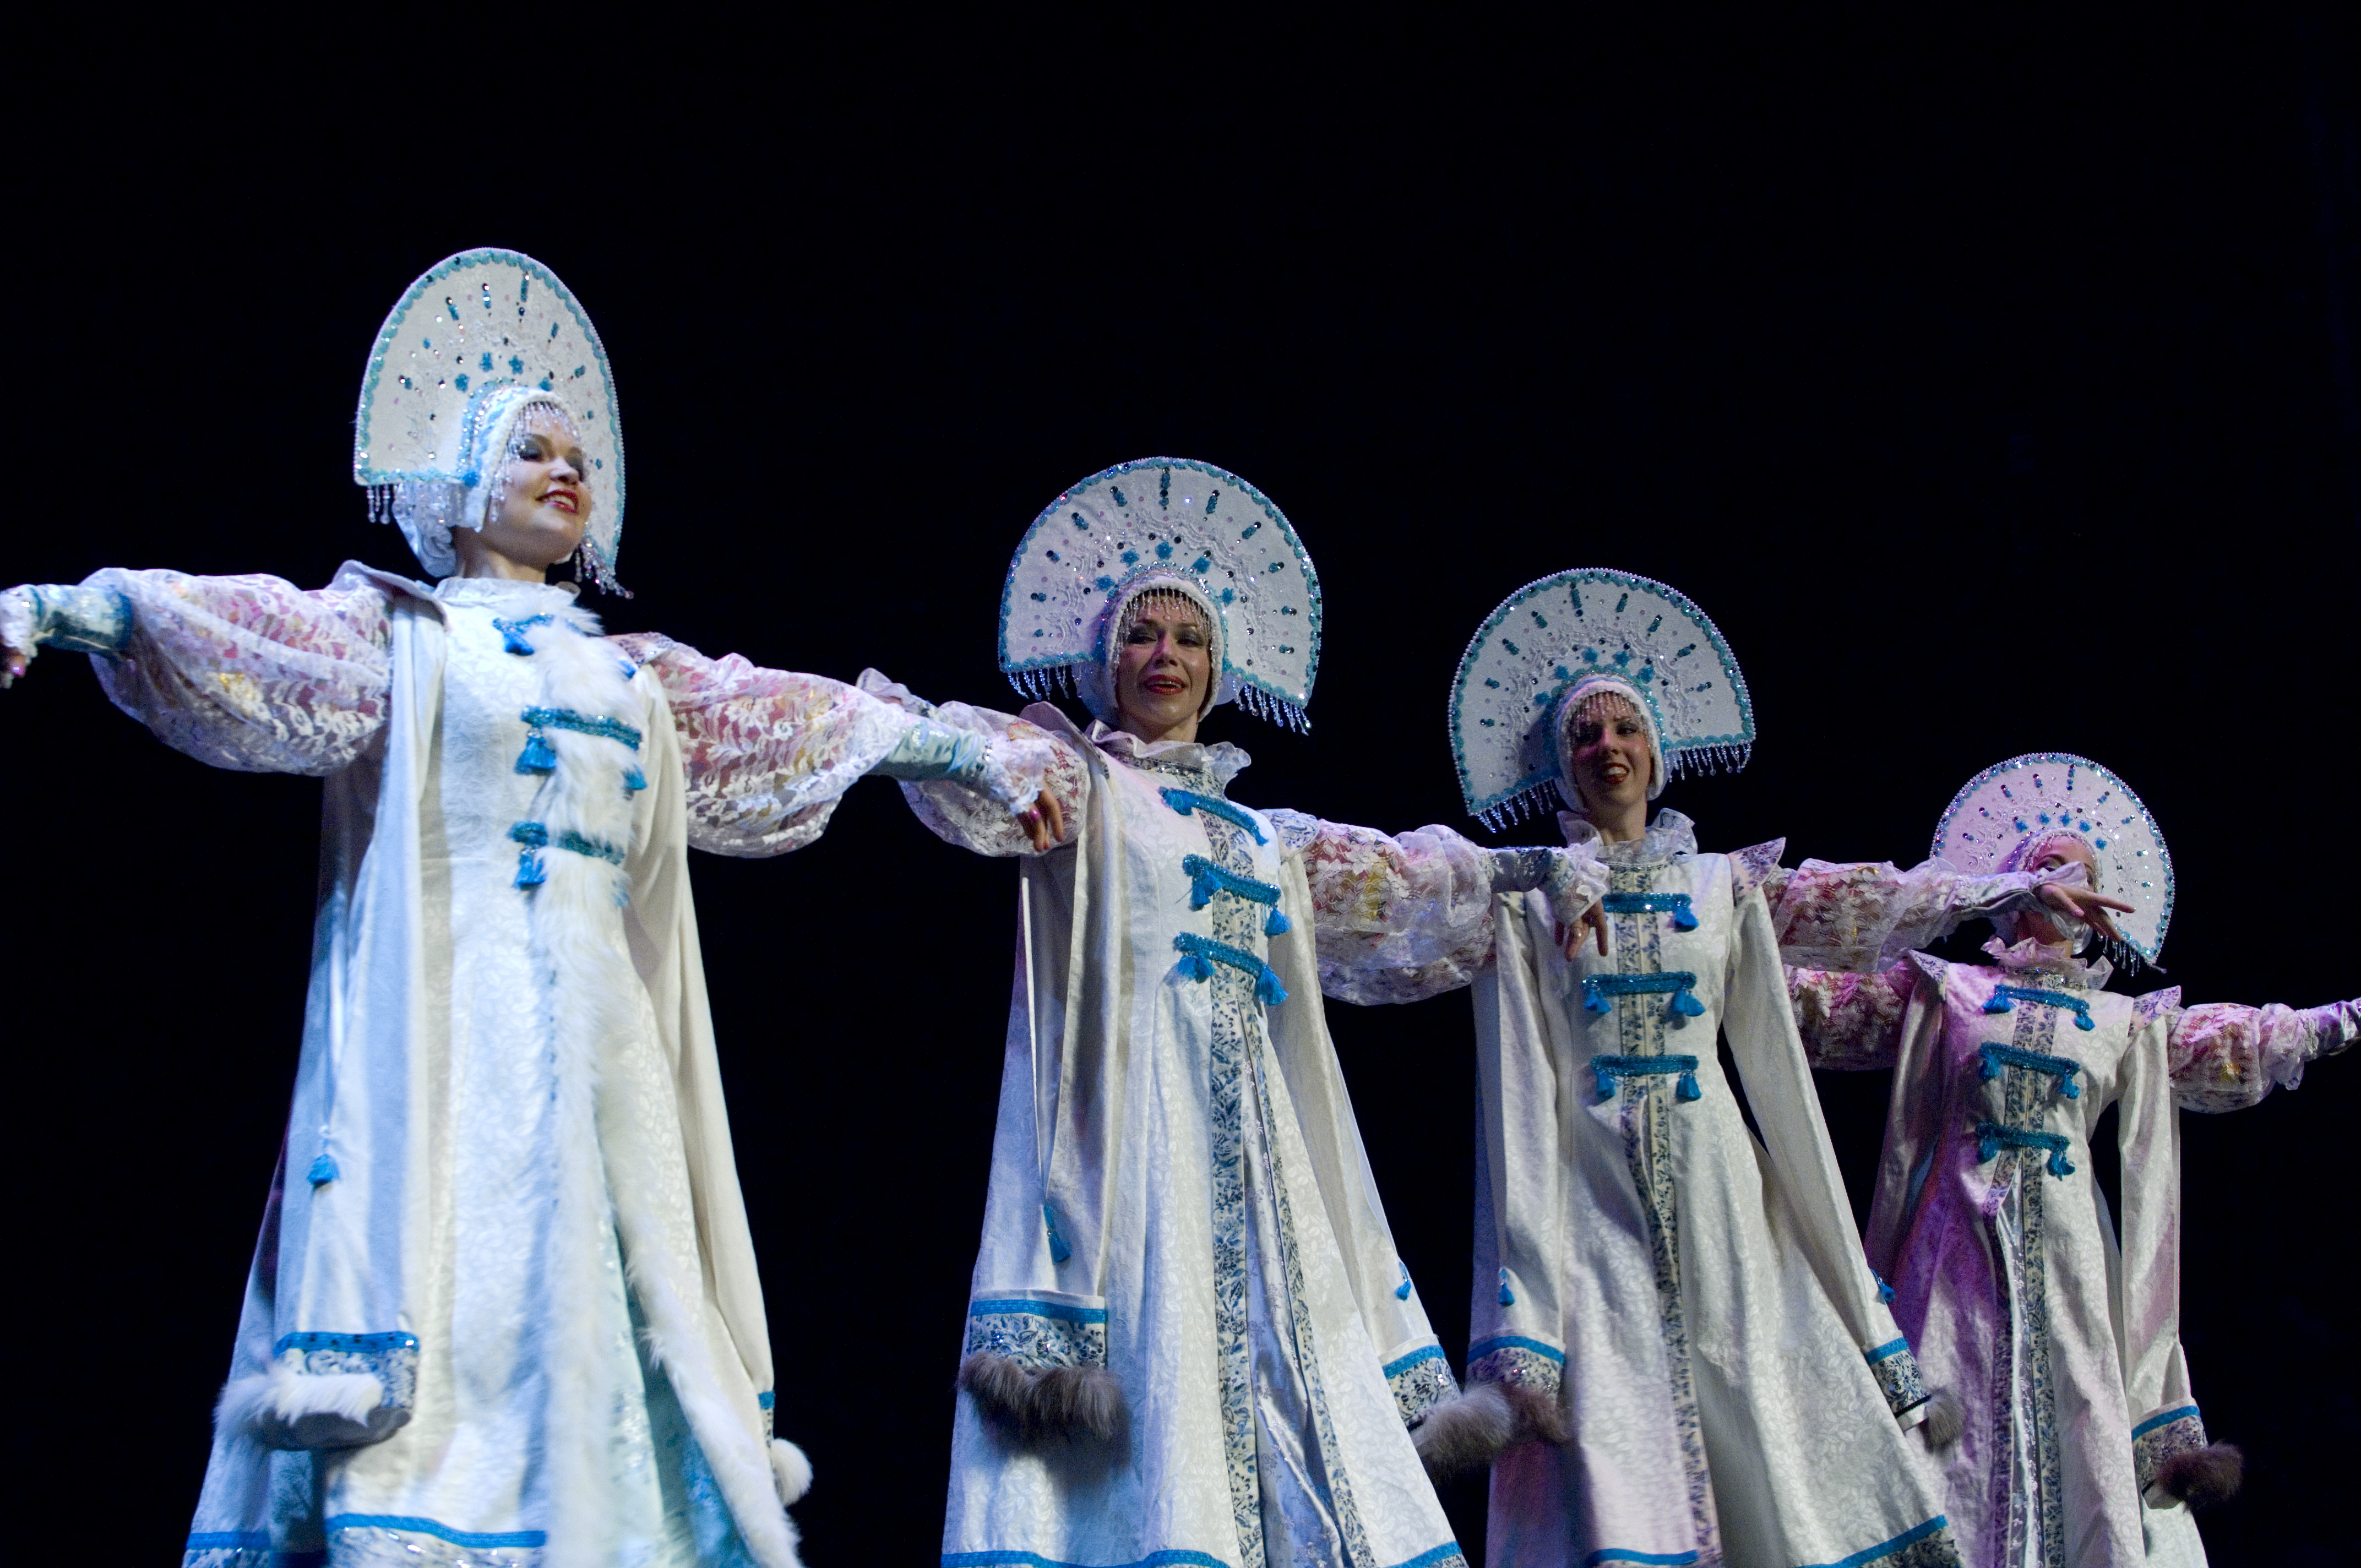 http://www.barynya.com/photos/2009_stamford,ct/siberian_dance_01.jpg